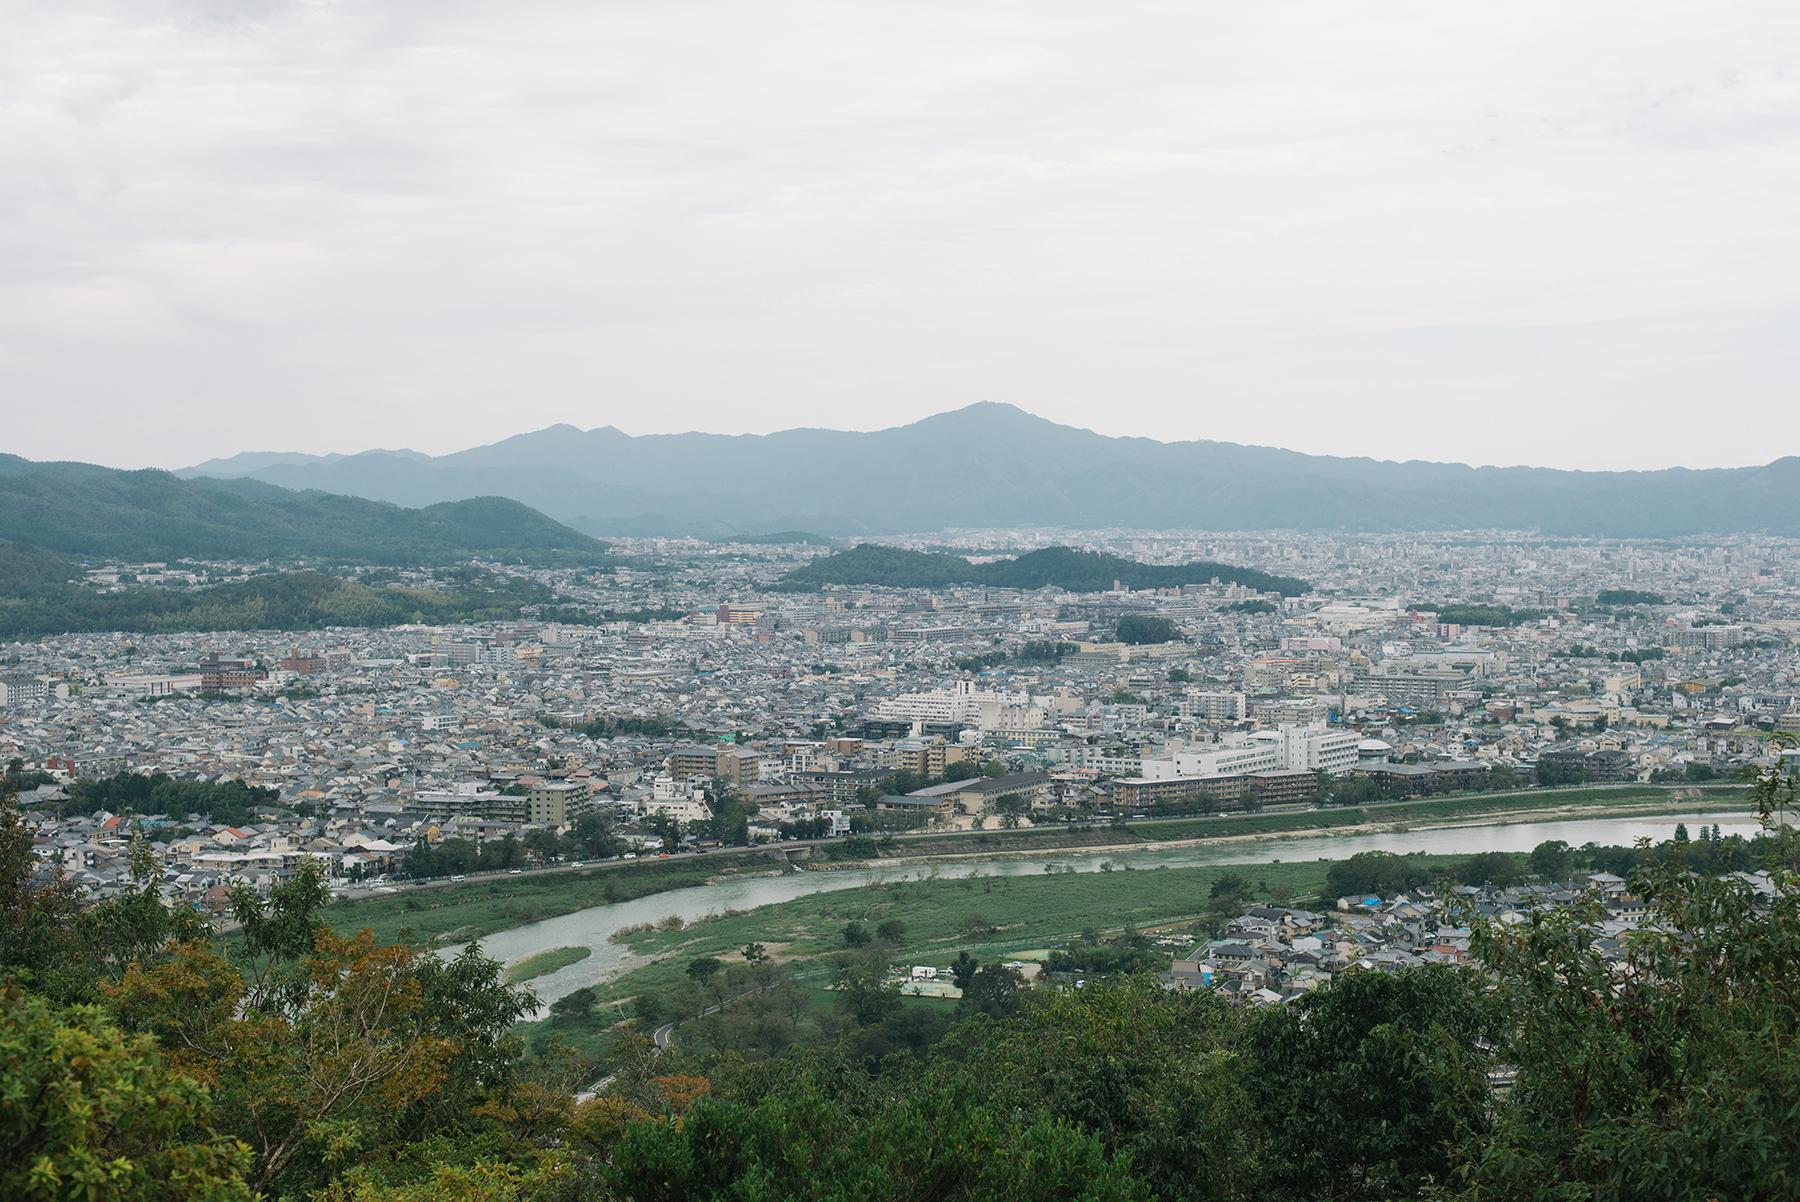 Arashiyama from the monkey park